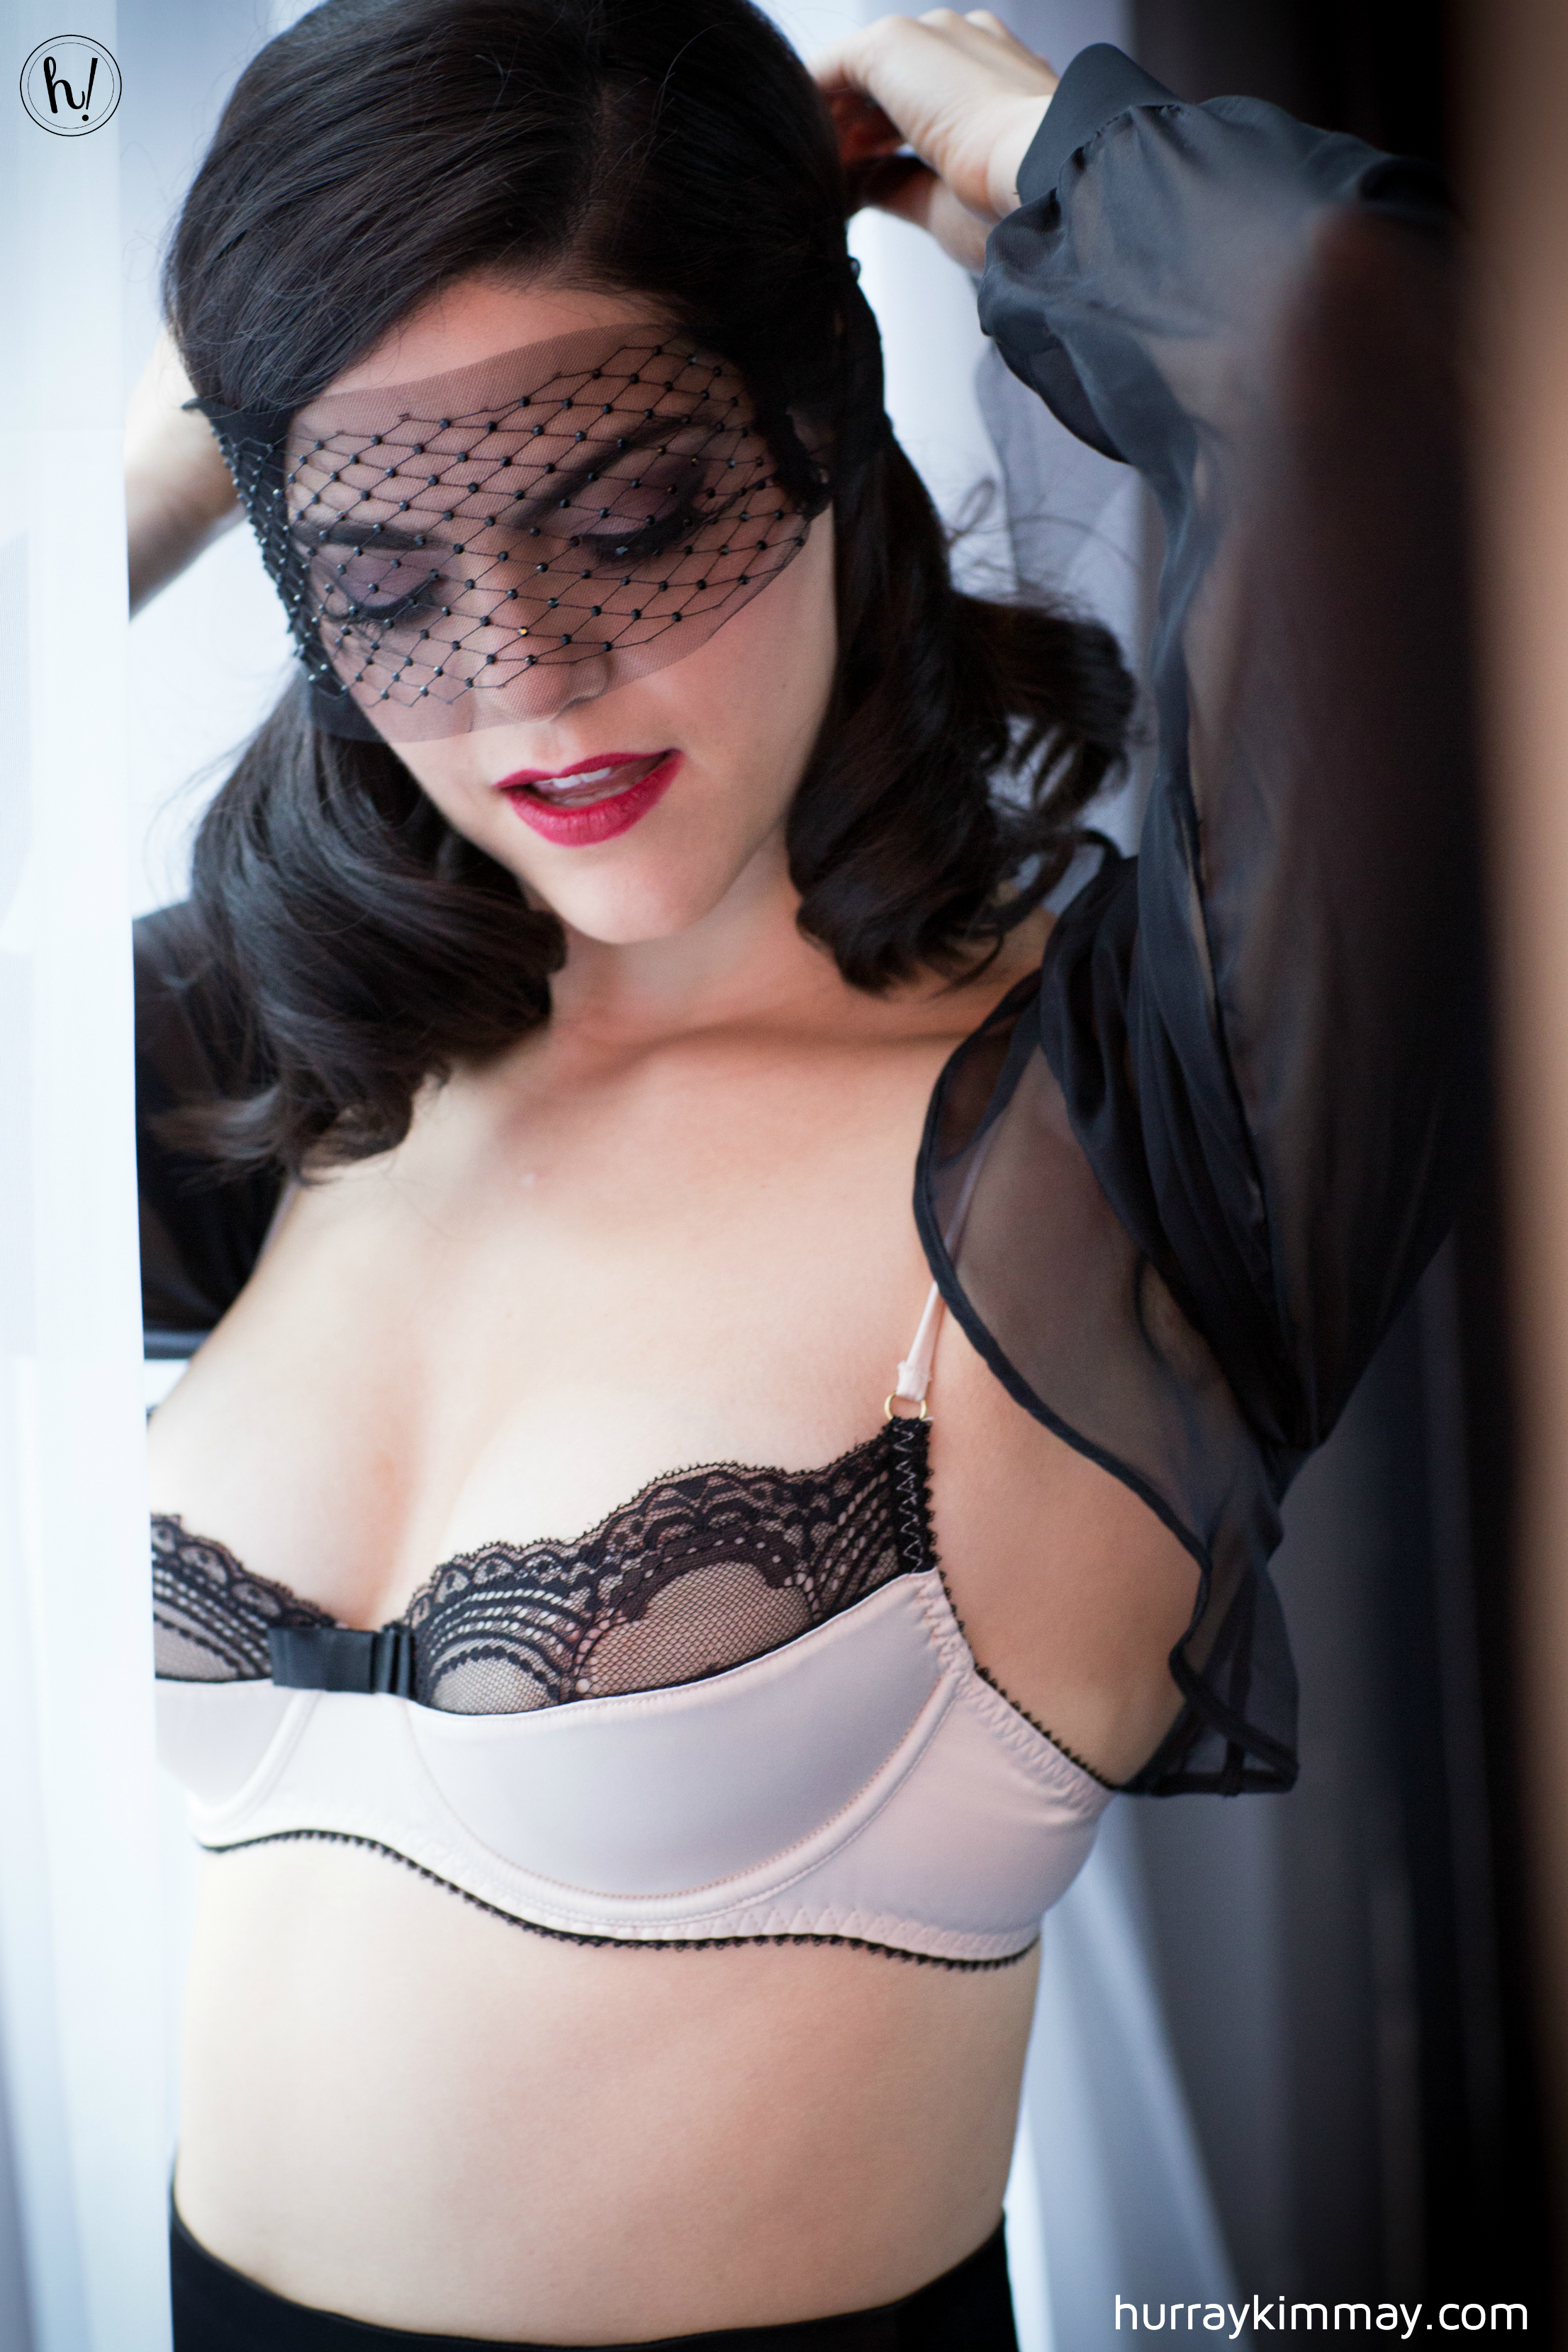 Kimmay wearing Maison Close veil and quarter bra bolero